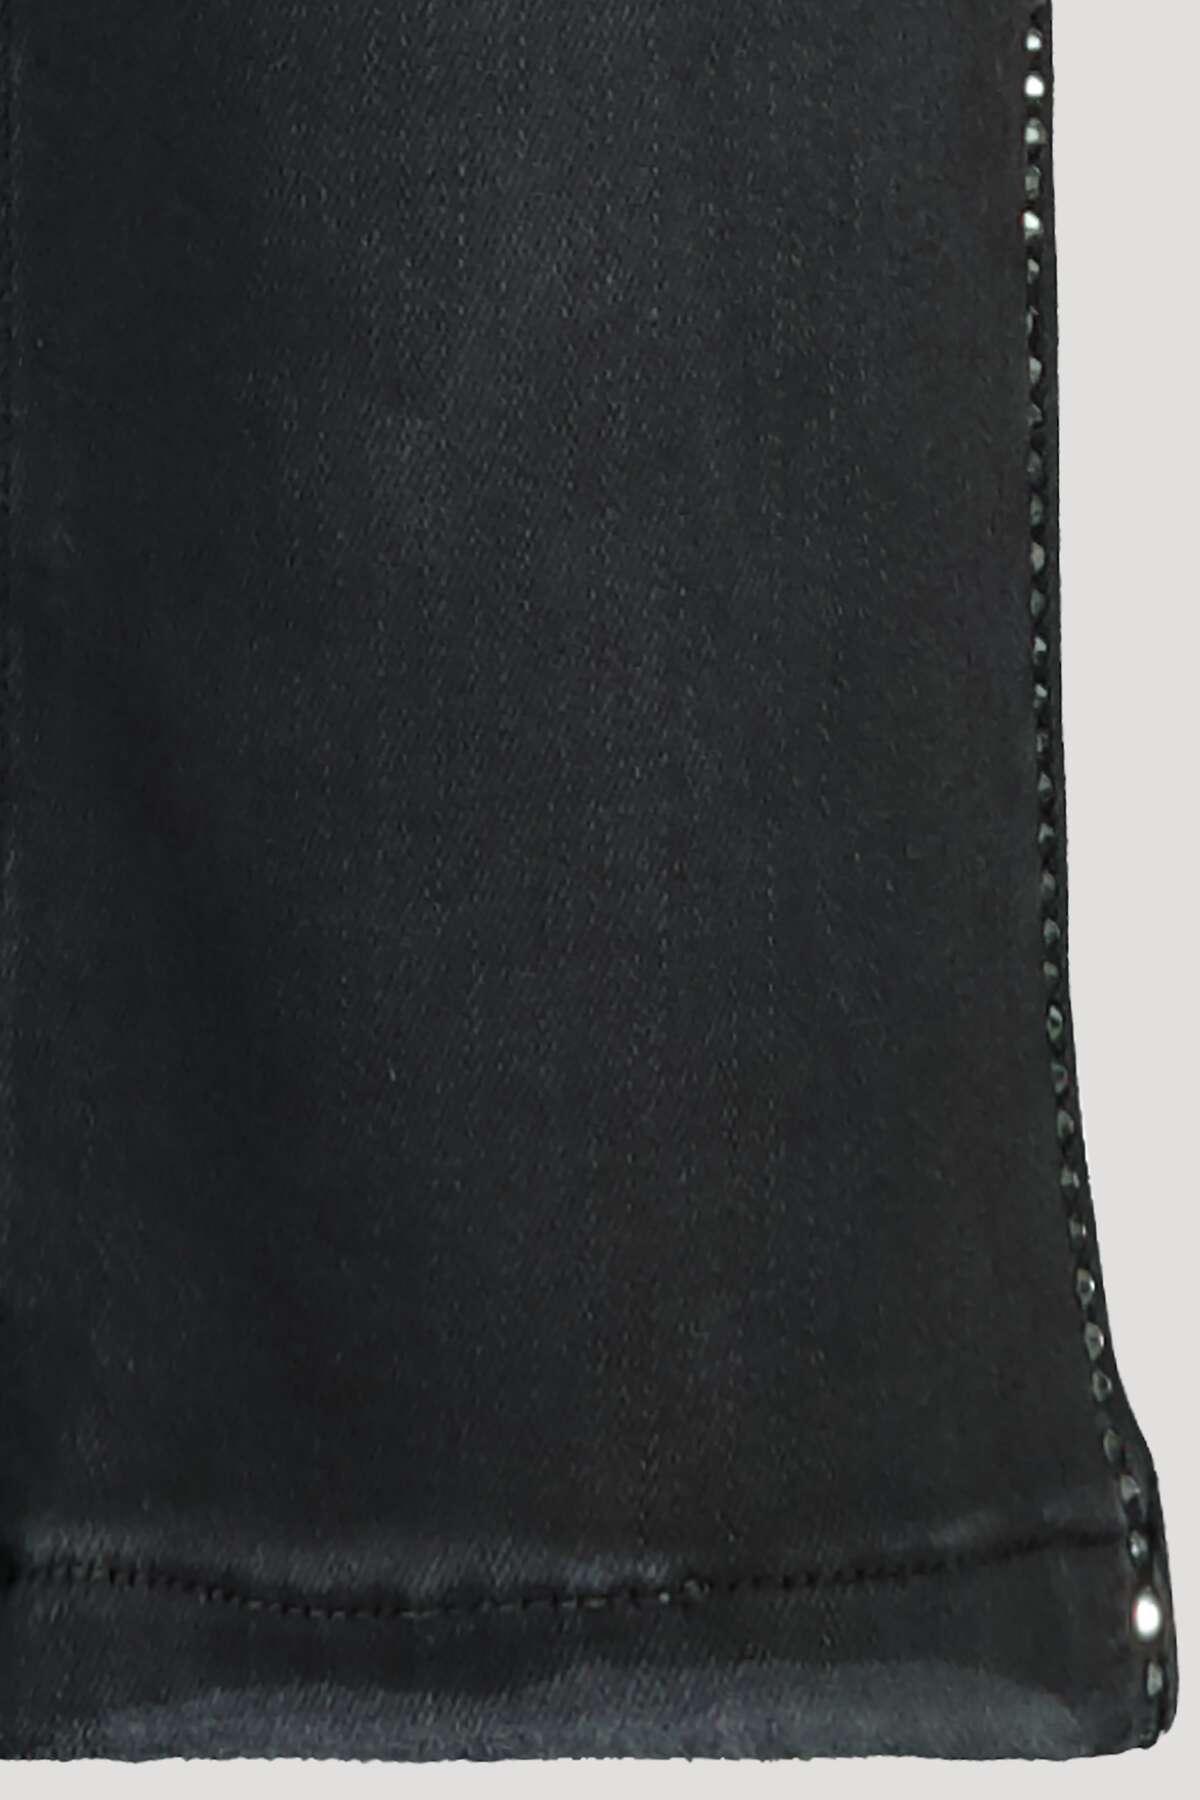 Monari 7/8 Jeans Cape Town black